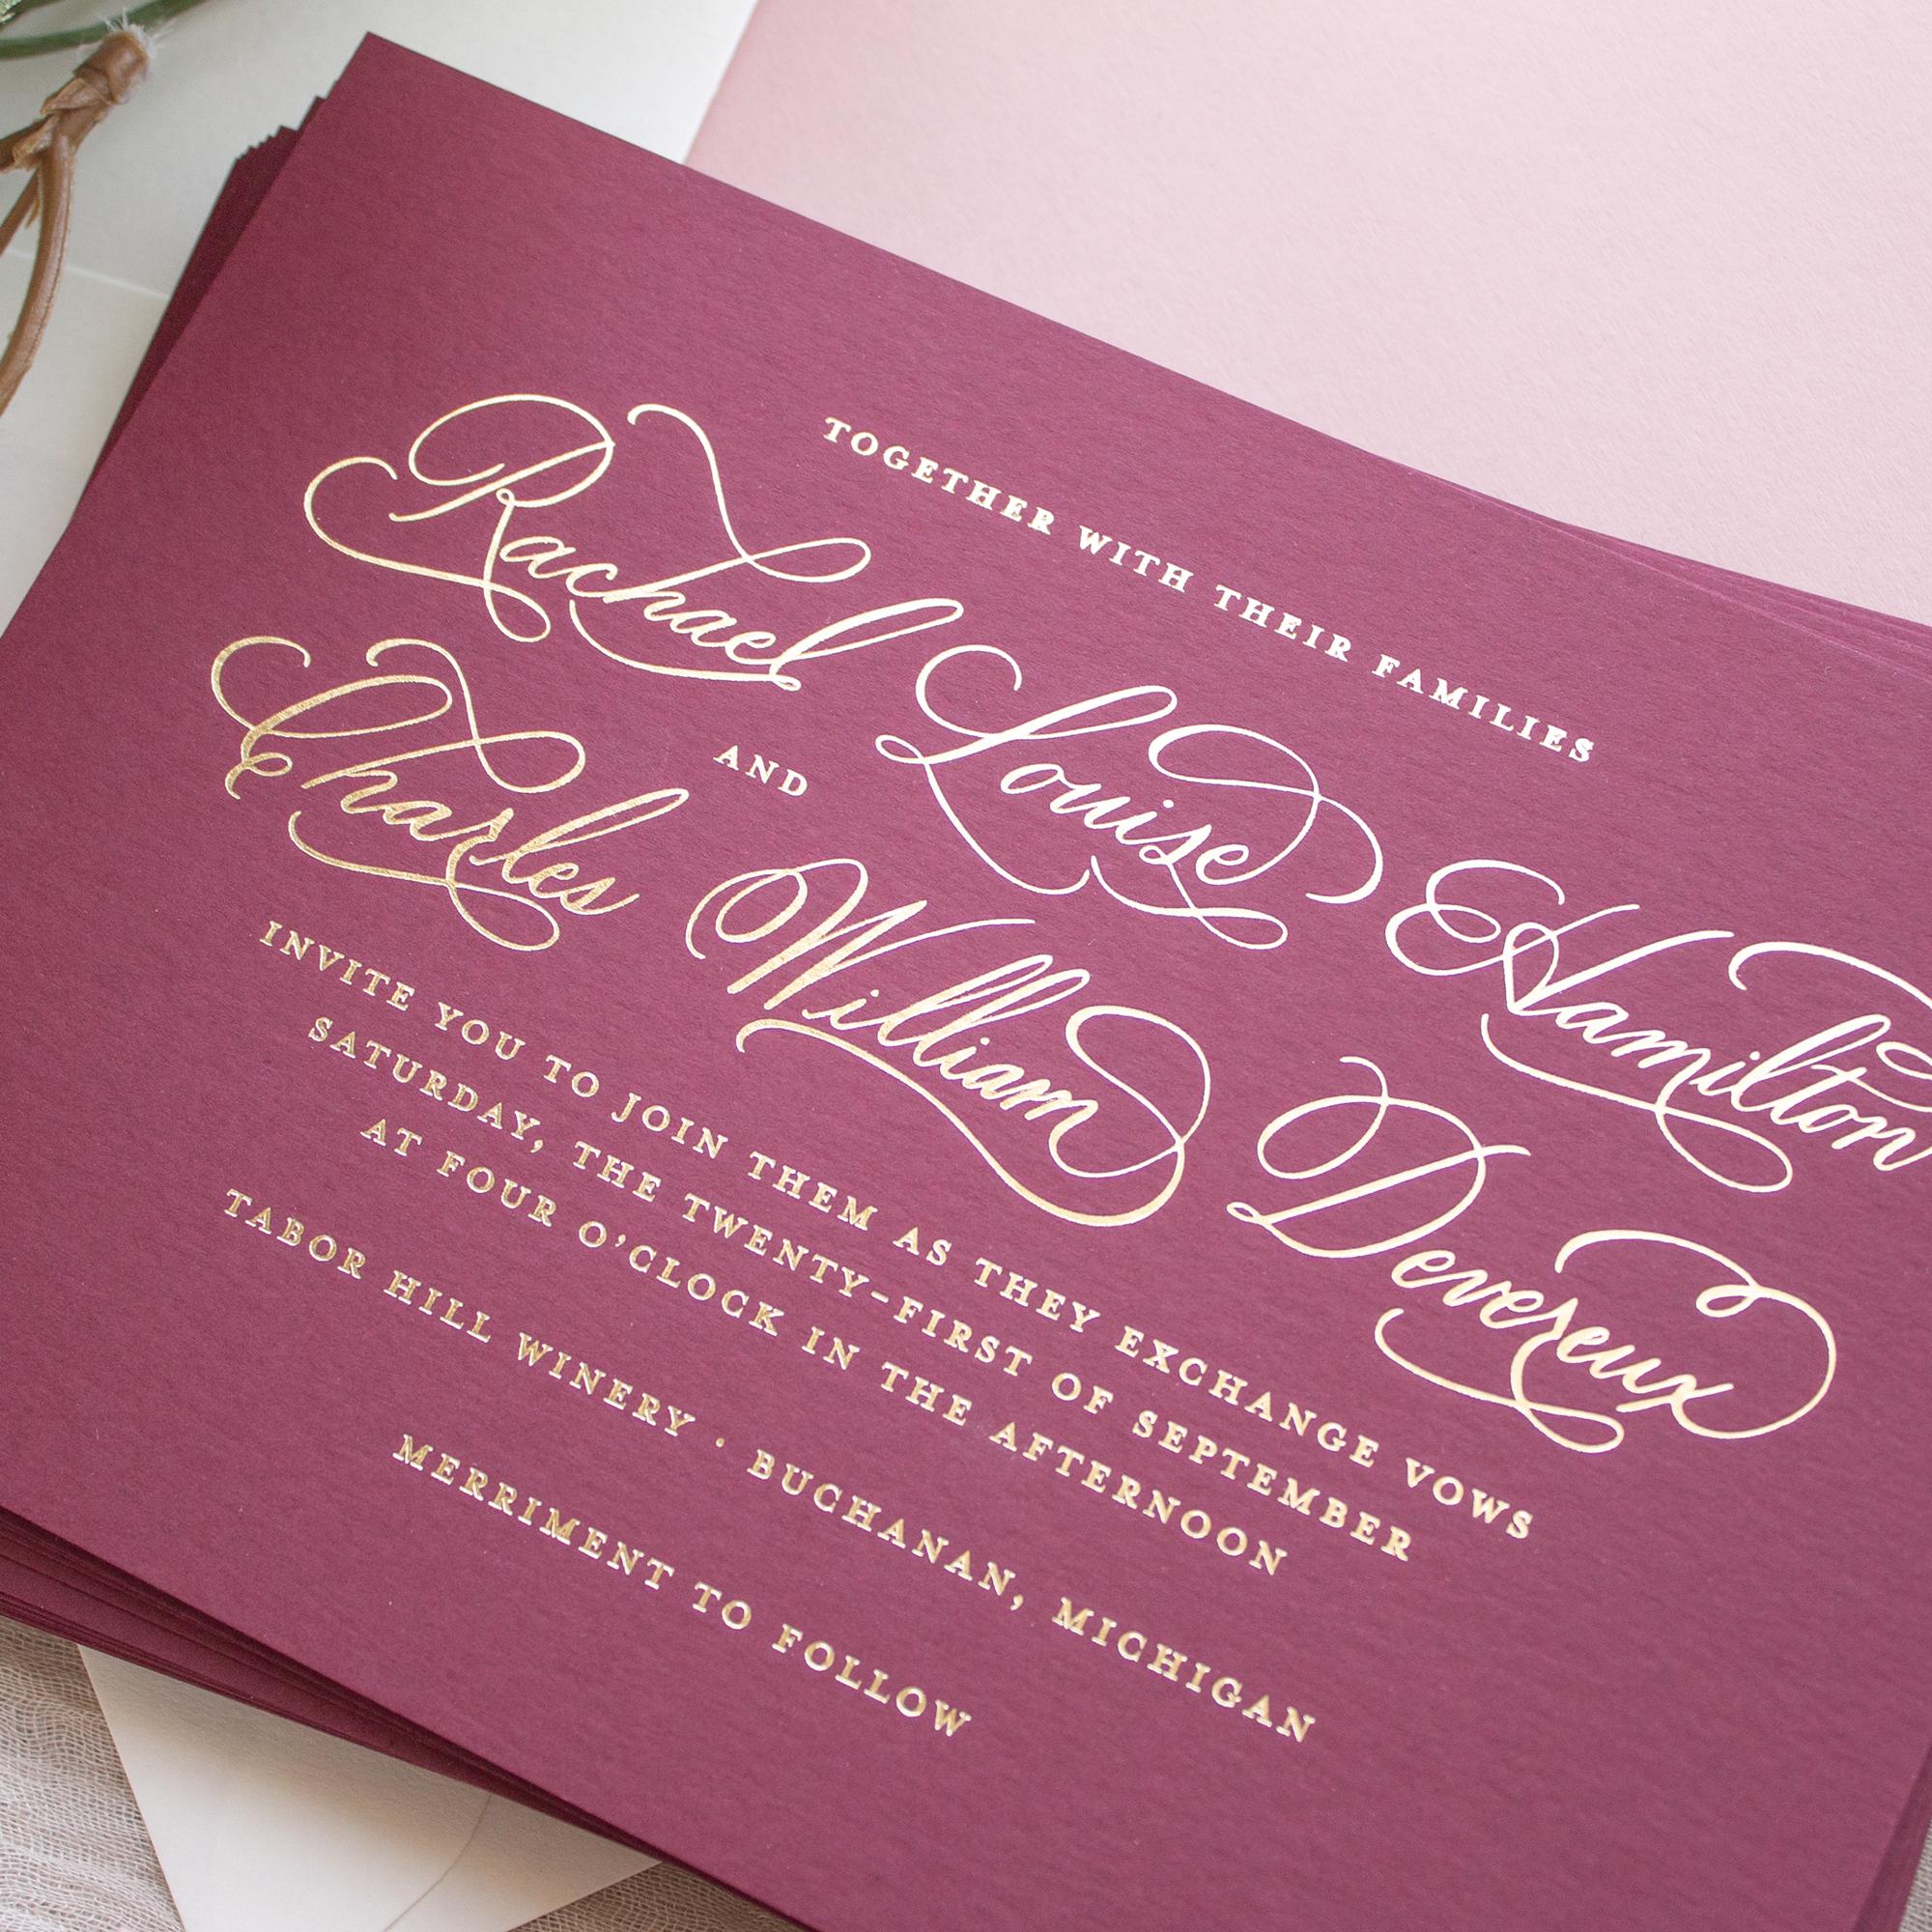 tabor hill winery wedding invitation